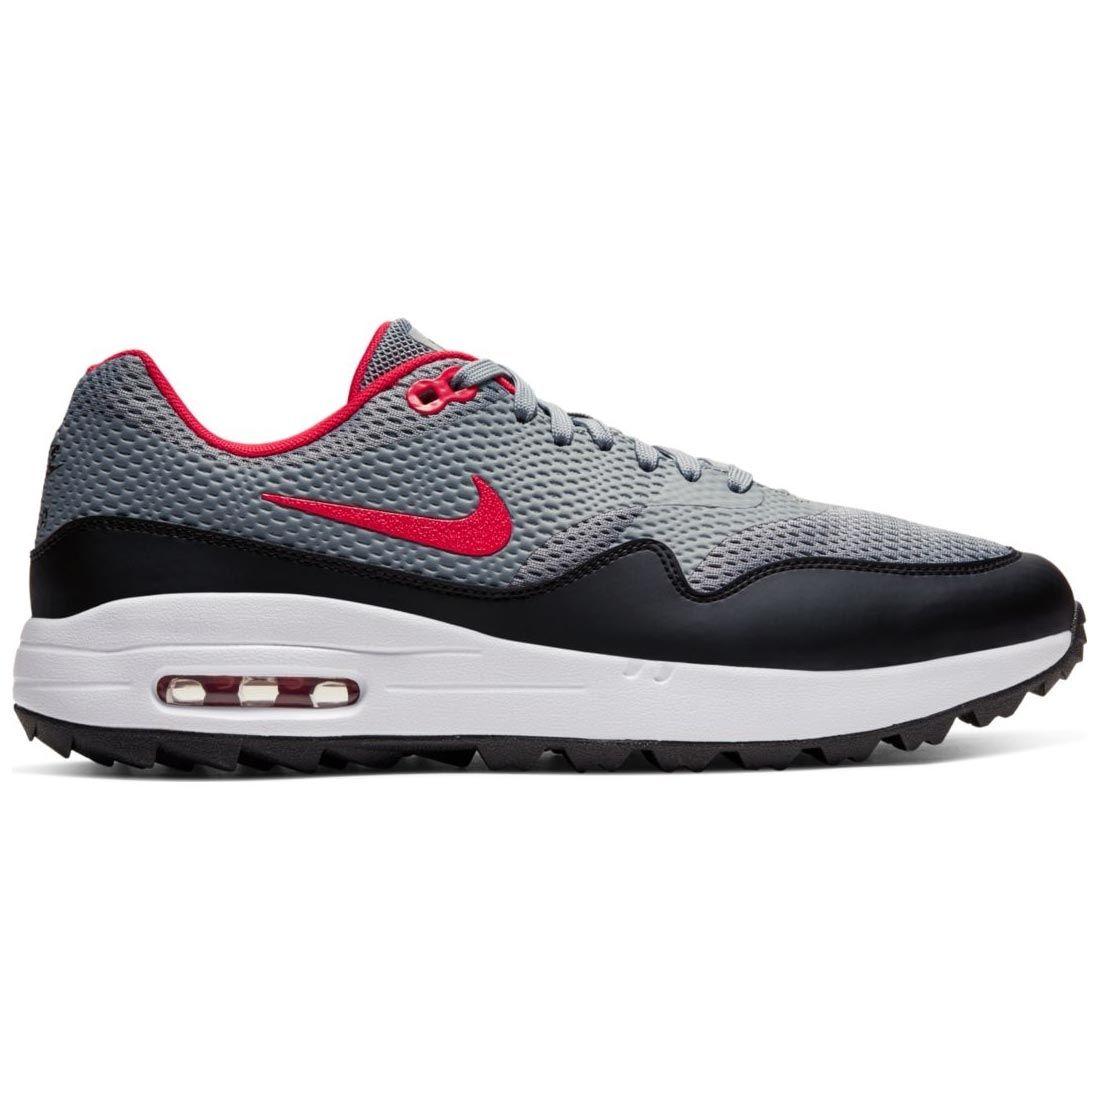 Buy Nike Air Max 1 G Golf Shoes